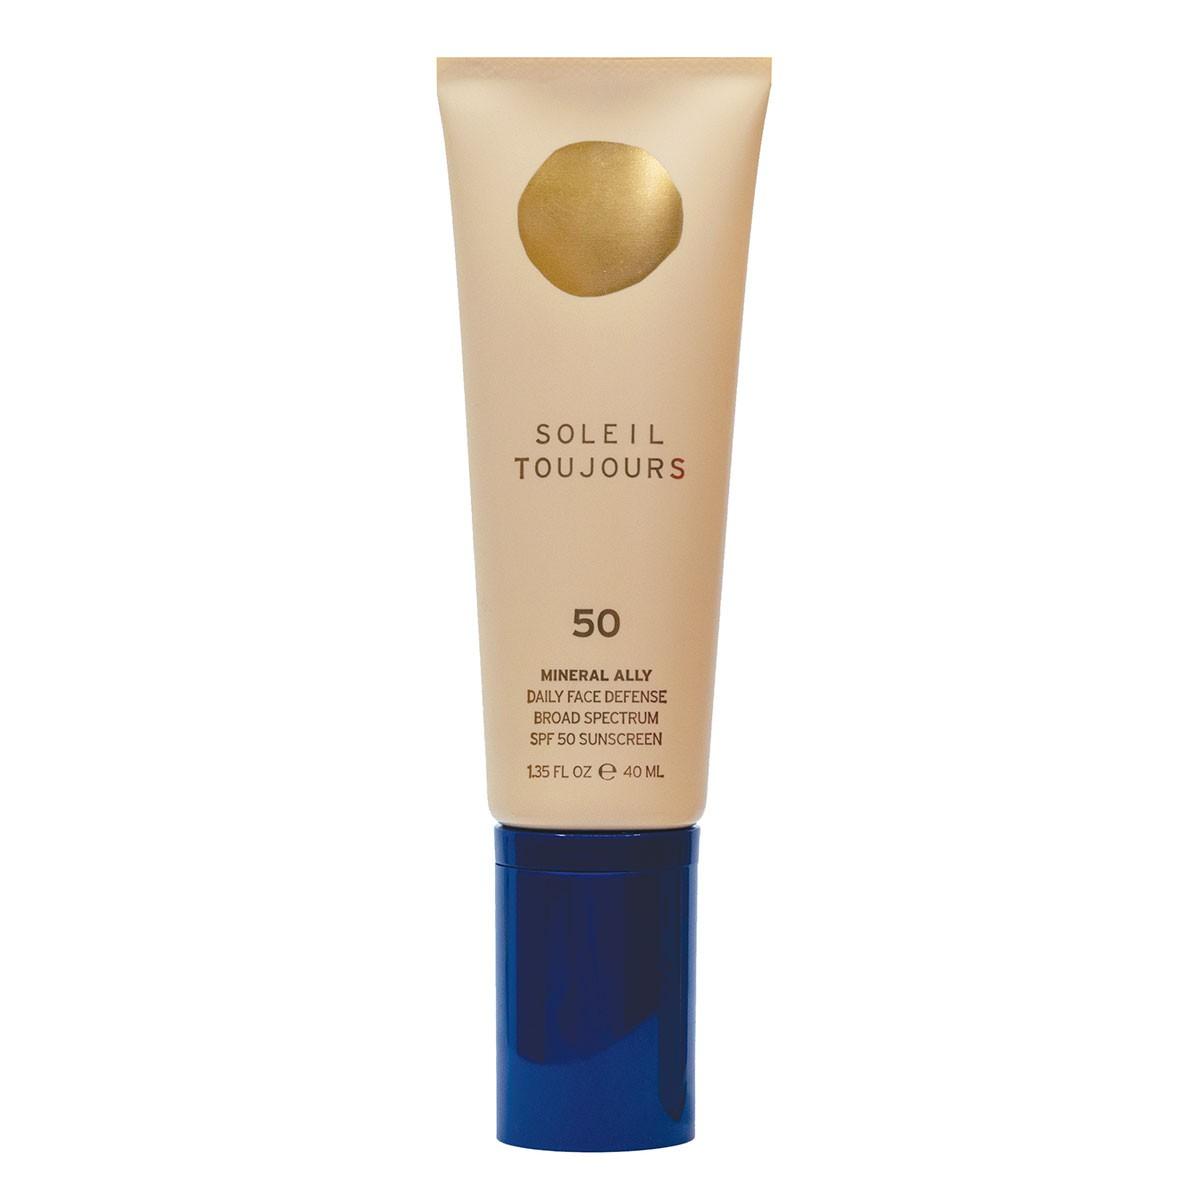 Soleil Toujours Mineral Ally Face Defense SPF 50 - Crema solar rostro mineral